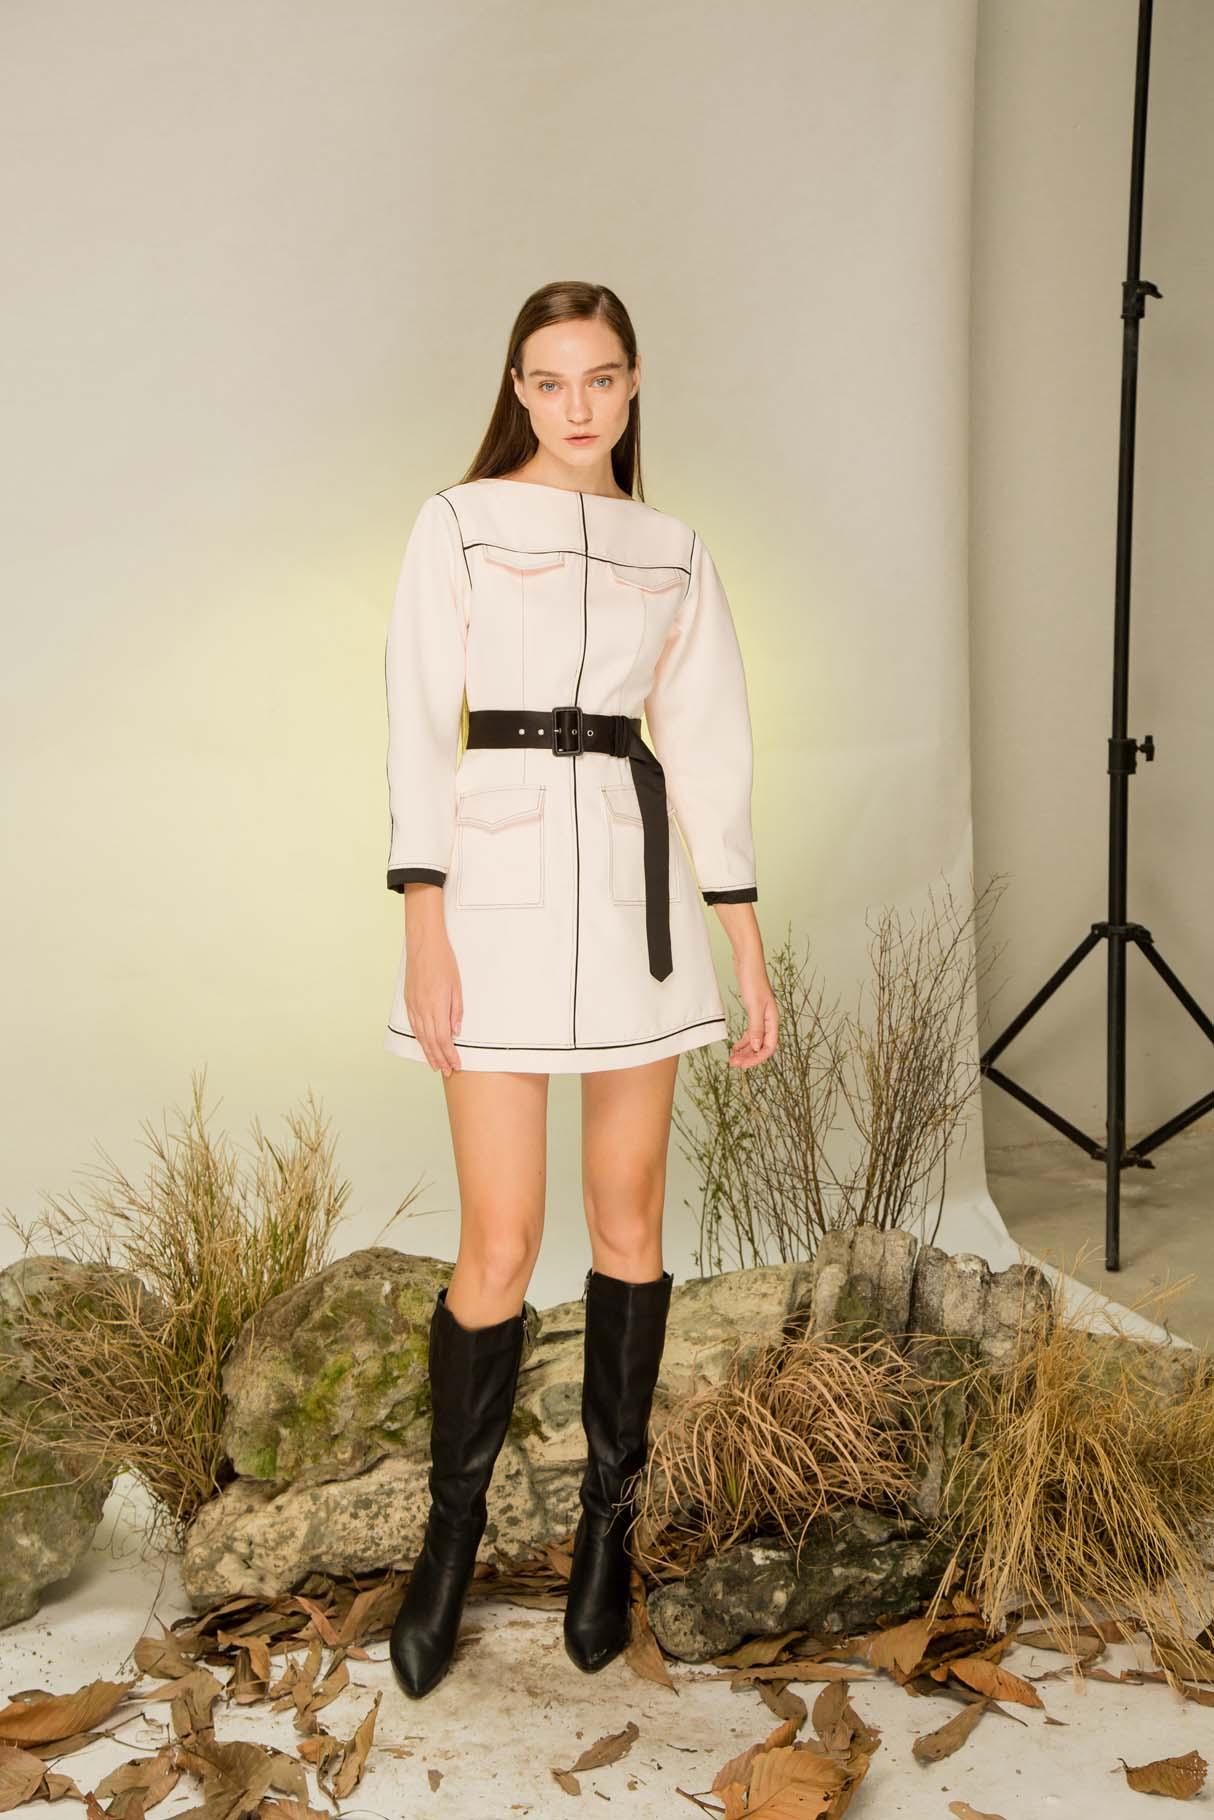 fashiongirl-qua-valentine-elleman-0220-2